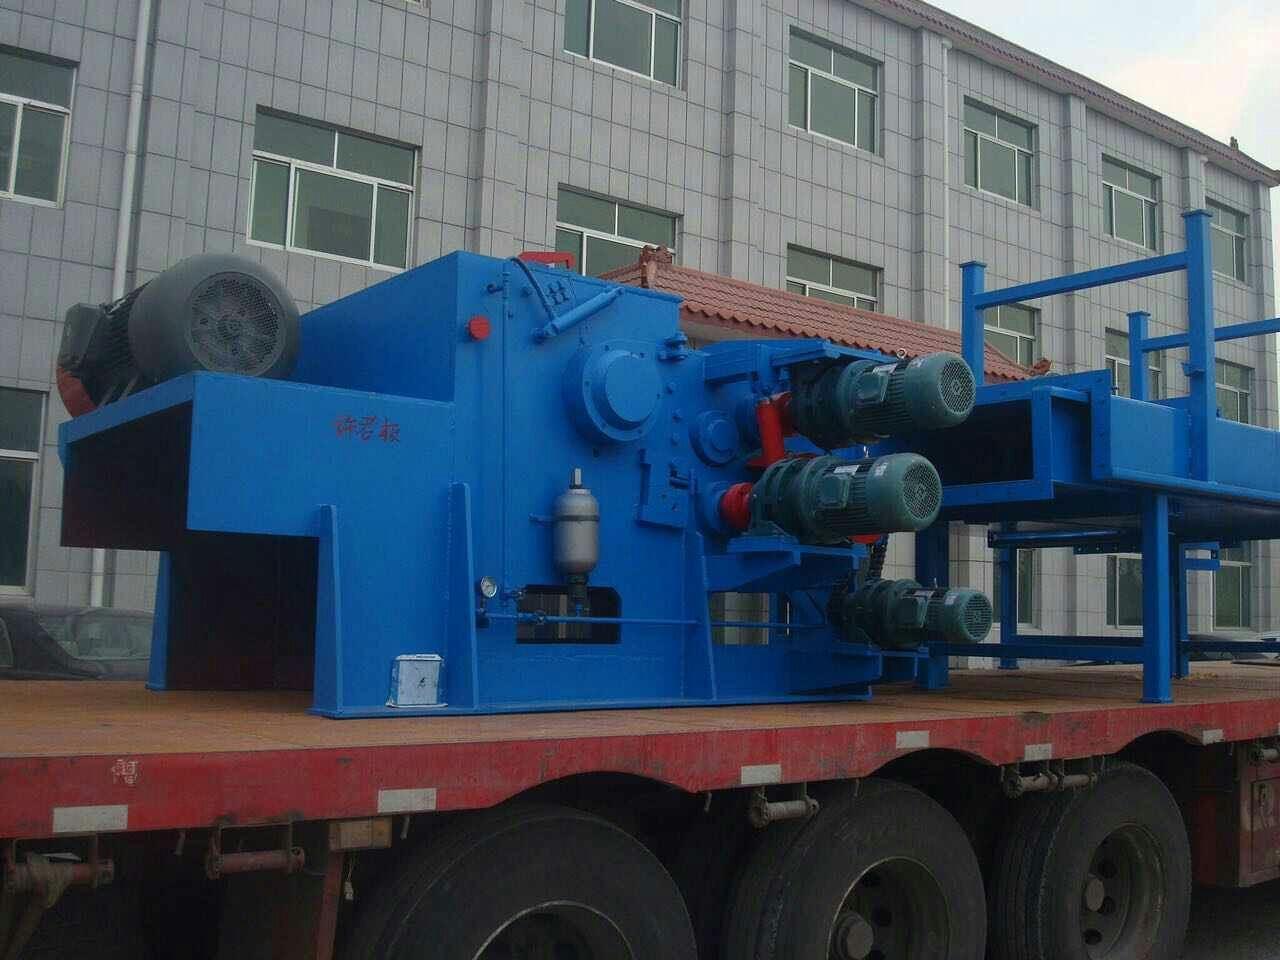 Ly-318d 30-35t/H Drum Type Wood Chipper Machine Price